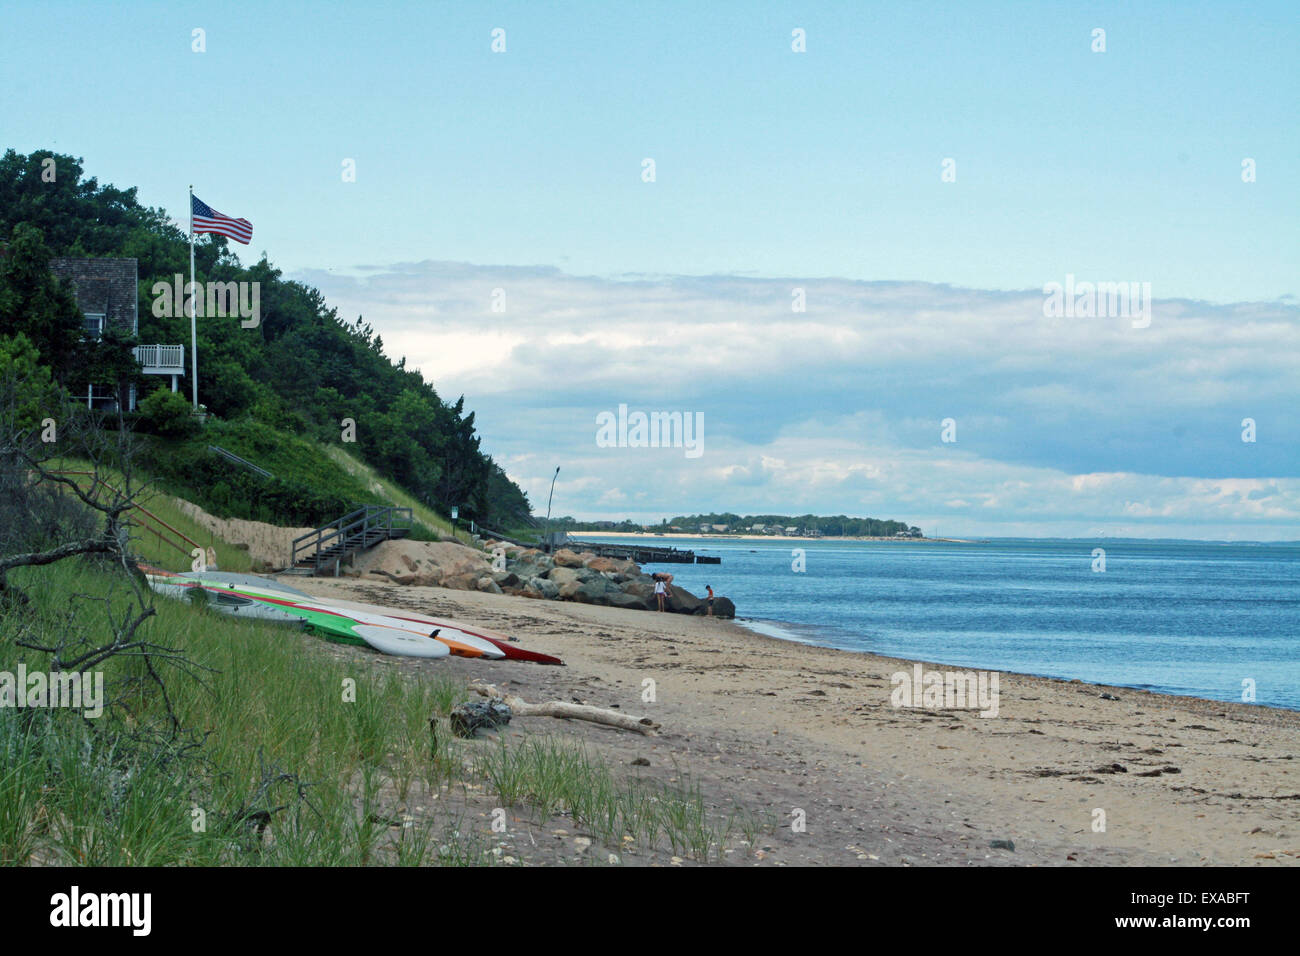 Gardiners Bay Shoreline Hamptons Beach Atlantic Ocean Long Island New York - Stock Image